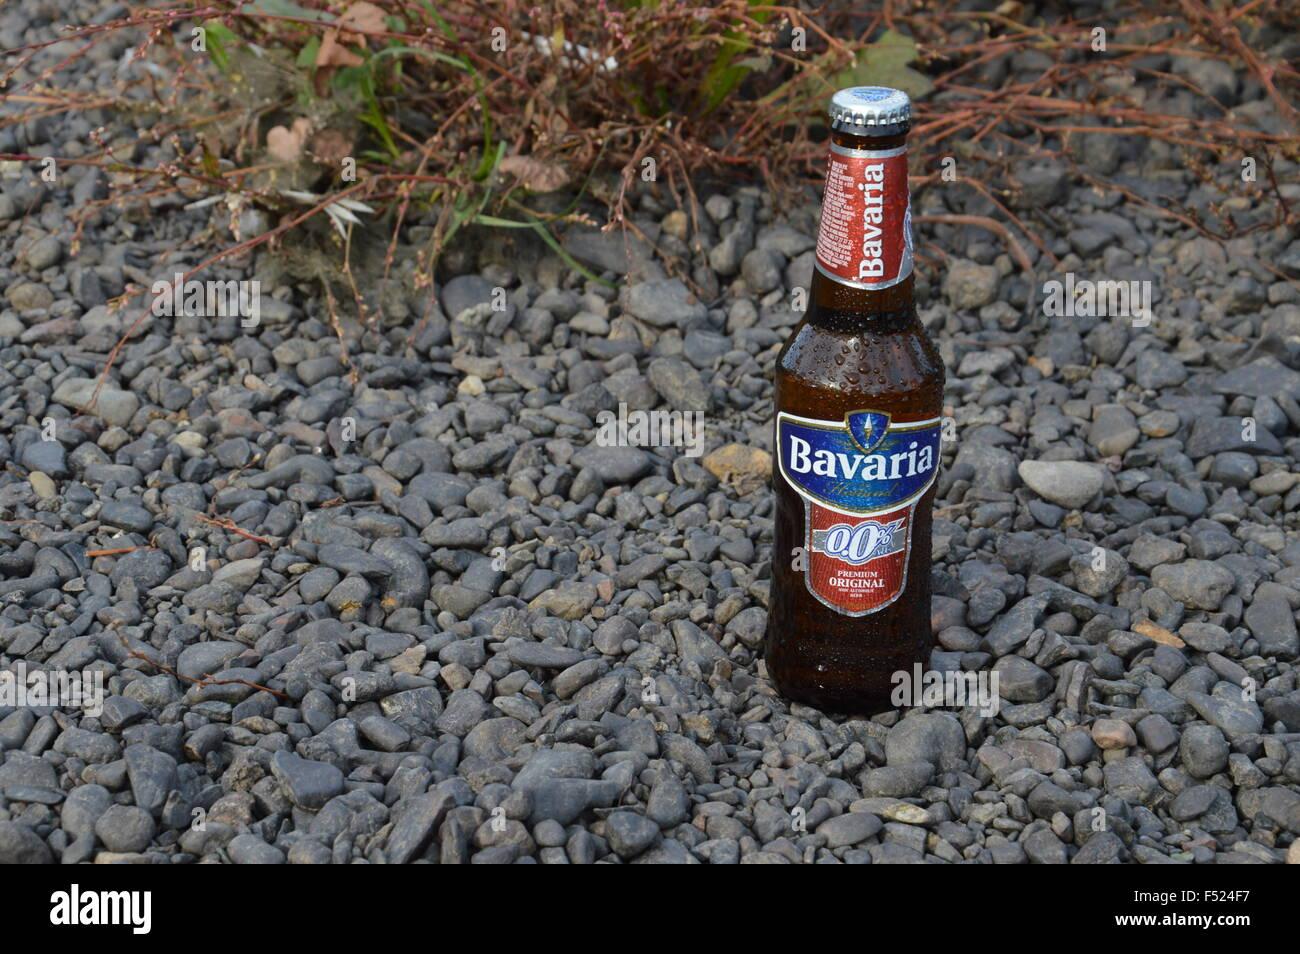 illustrative bottle non alcoholic beer Bavaria in nature - Stock Image